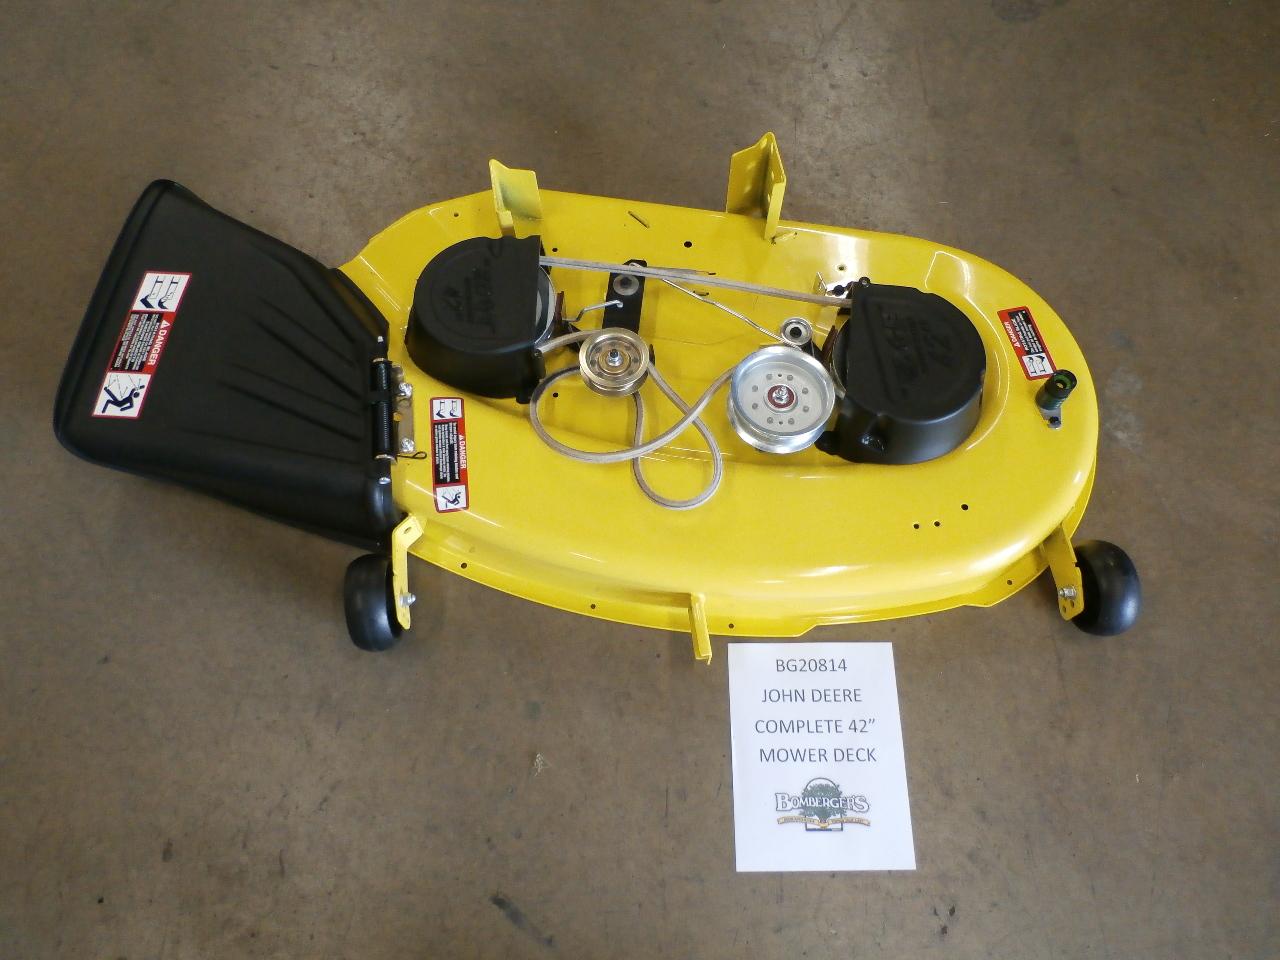 John Deere 115 Mower Belt Belts Www La125 Wiring Diagram 42 Deck Complete Bg20936 Bg20814